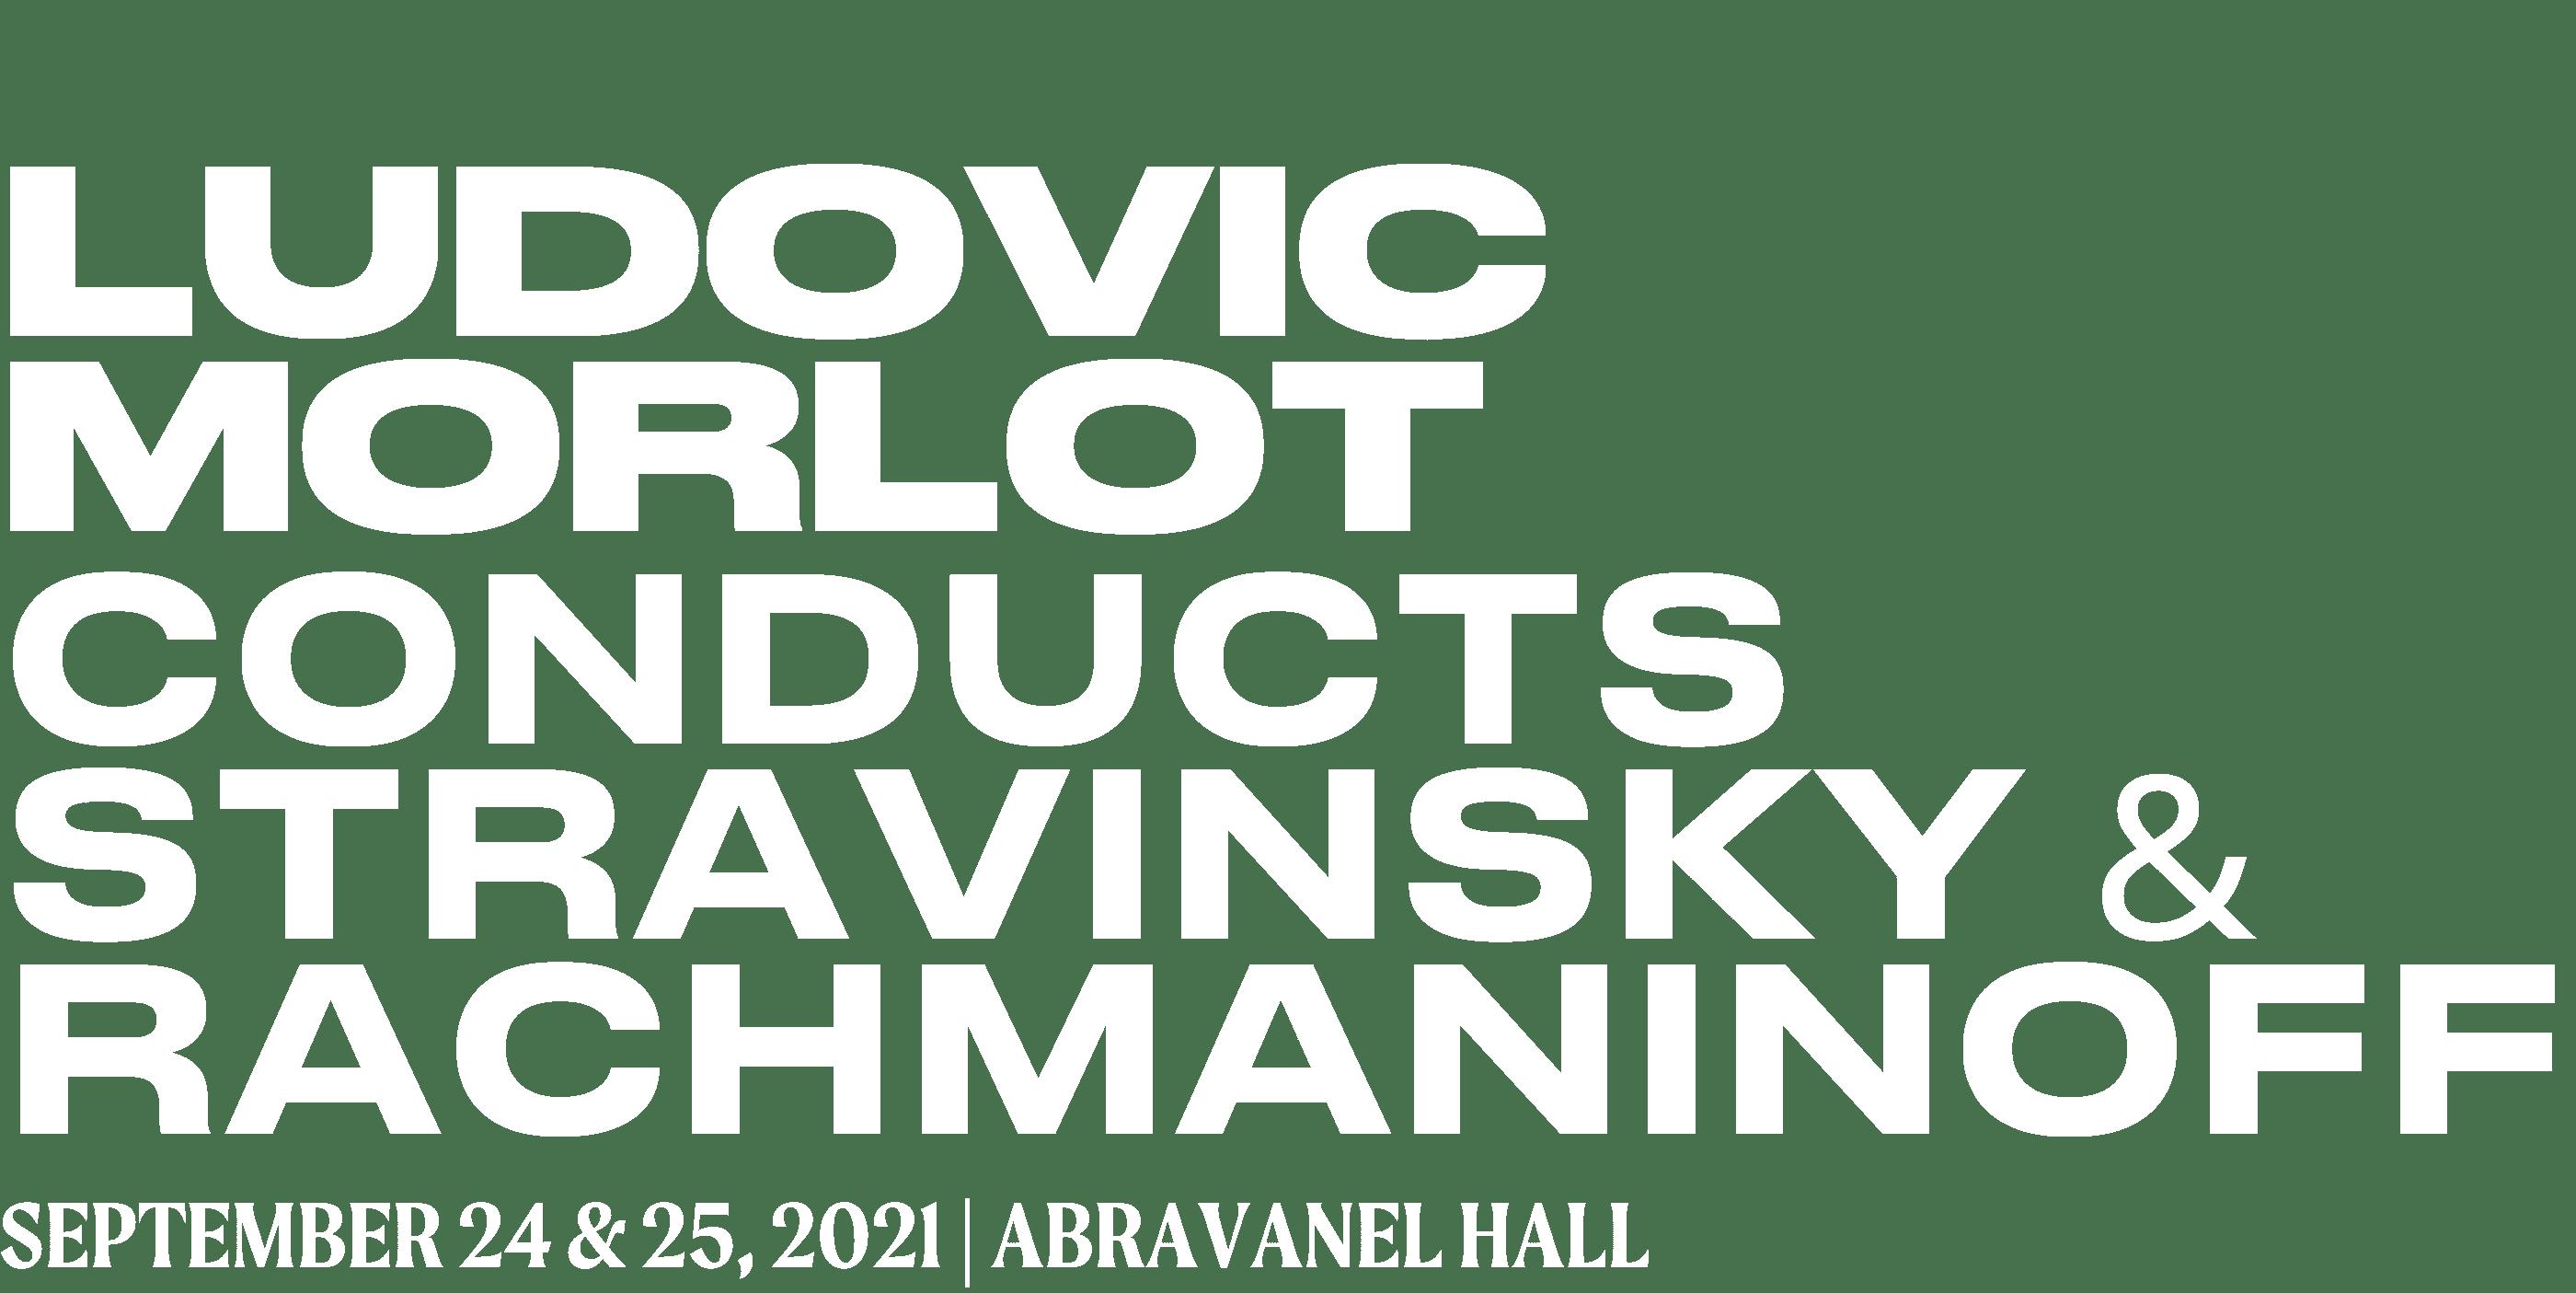 LUDOVIC MORLOT CONDUCTS STRAVINSKY & RACHMANINOFF